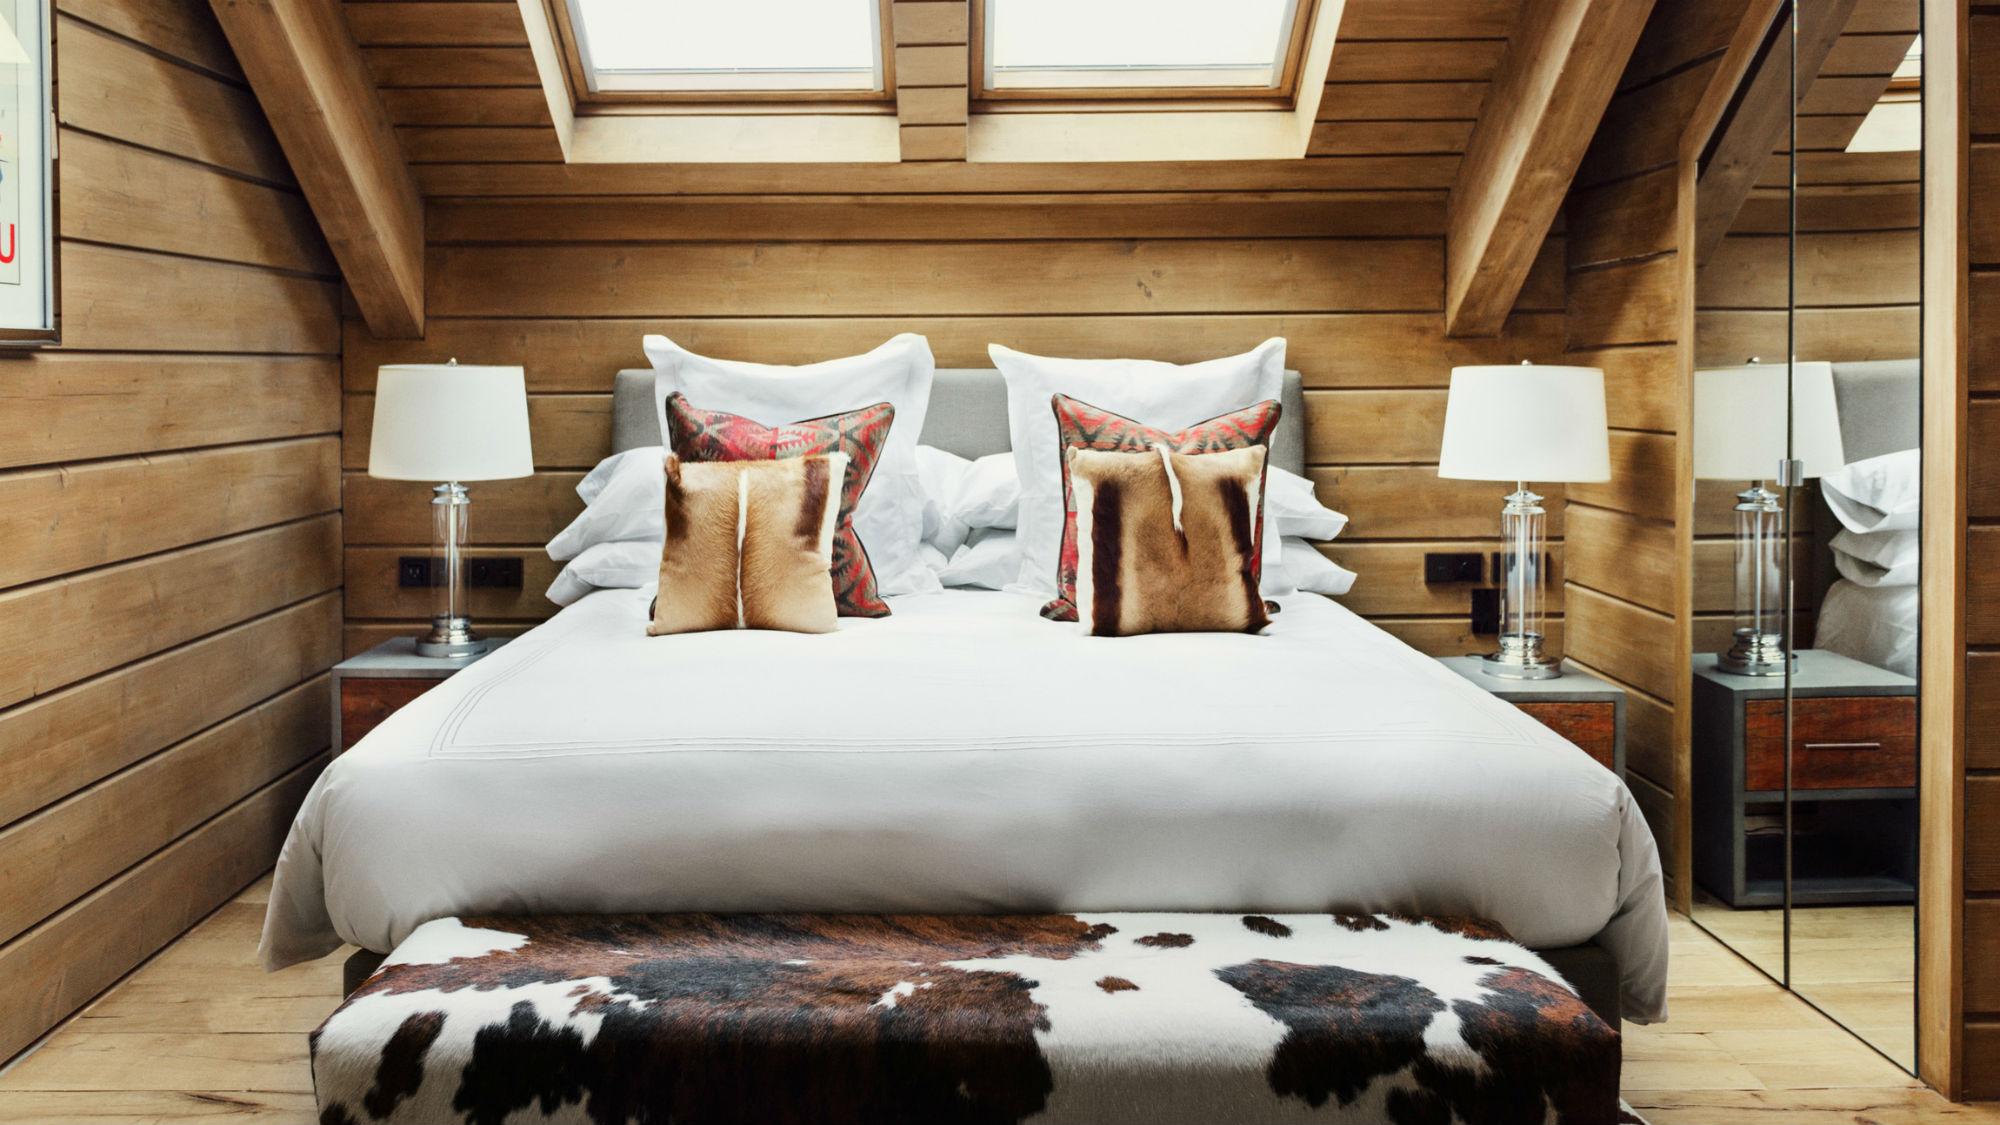 Double_Room_Bed_El_Lodge.jpg